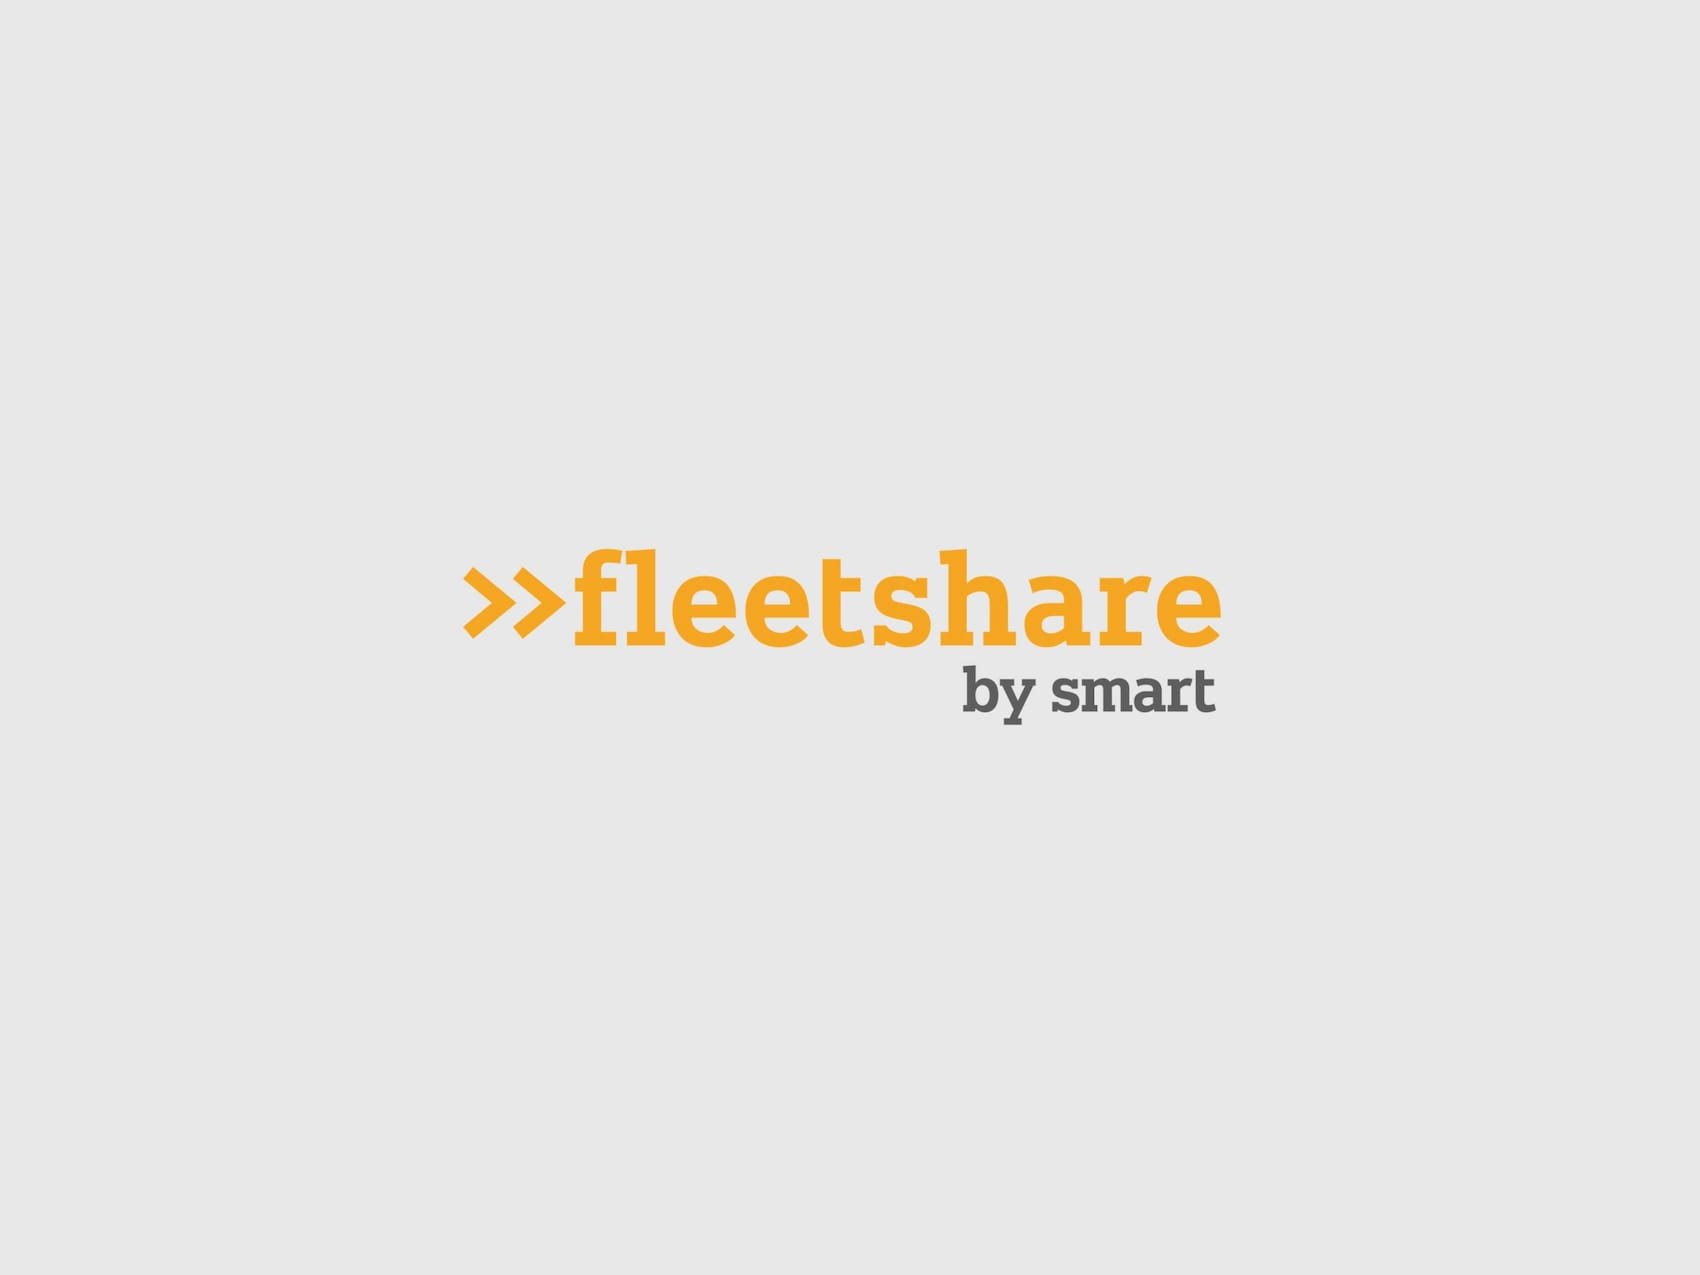 fleetshare by smart - Logo